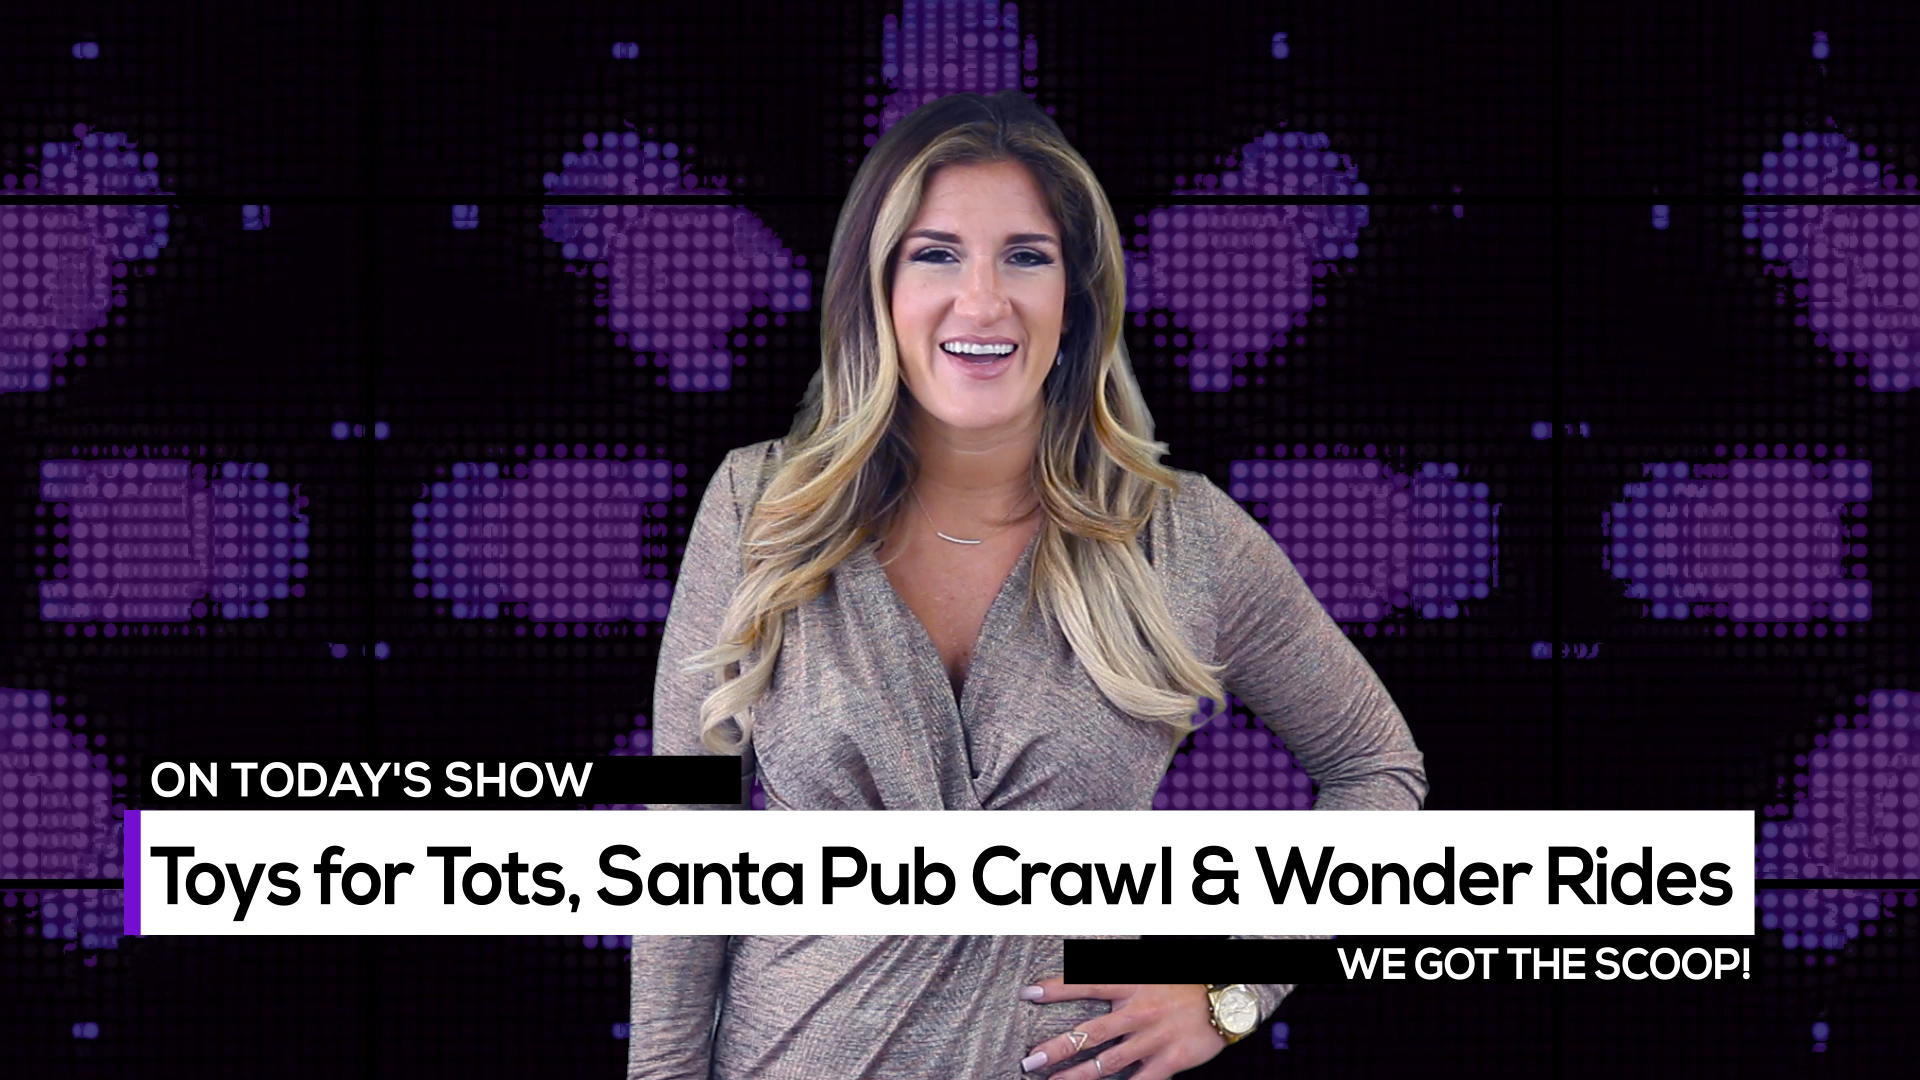 Toys For Tots, Santa Pub Crawl and Winter Wonder Rides